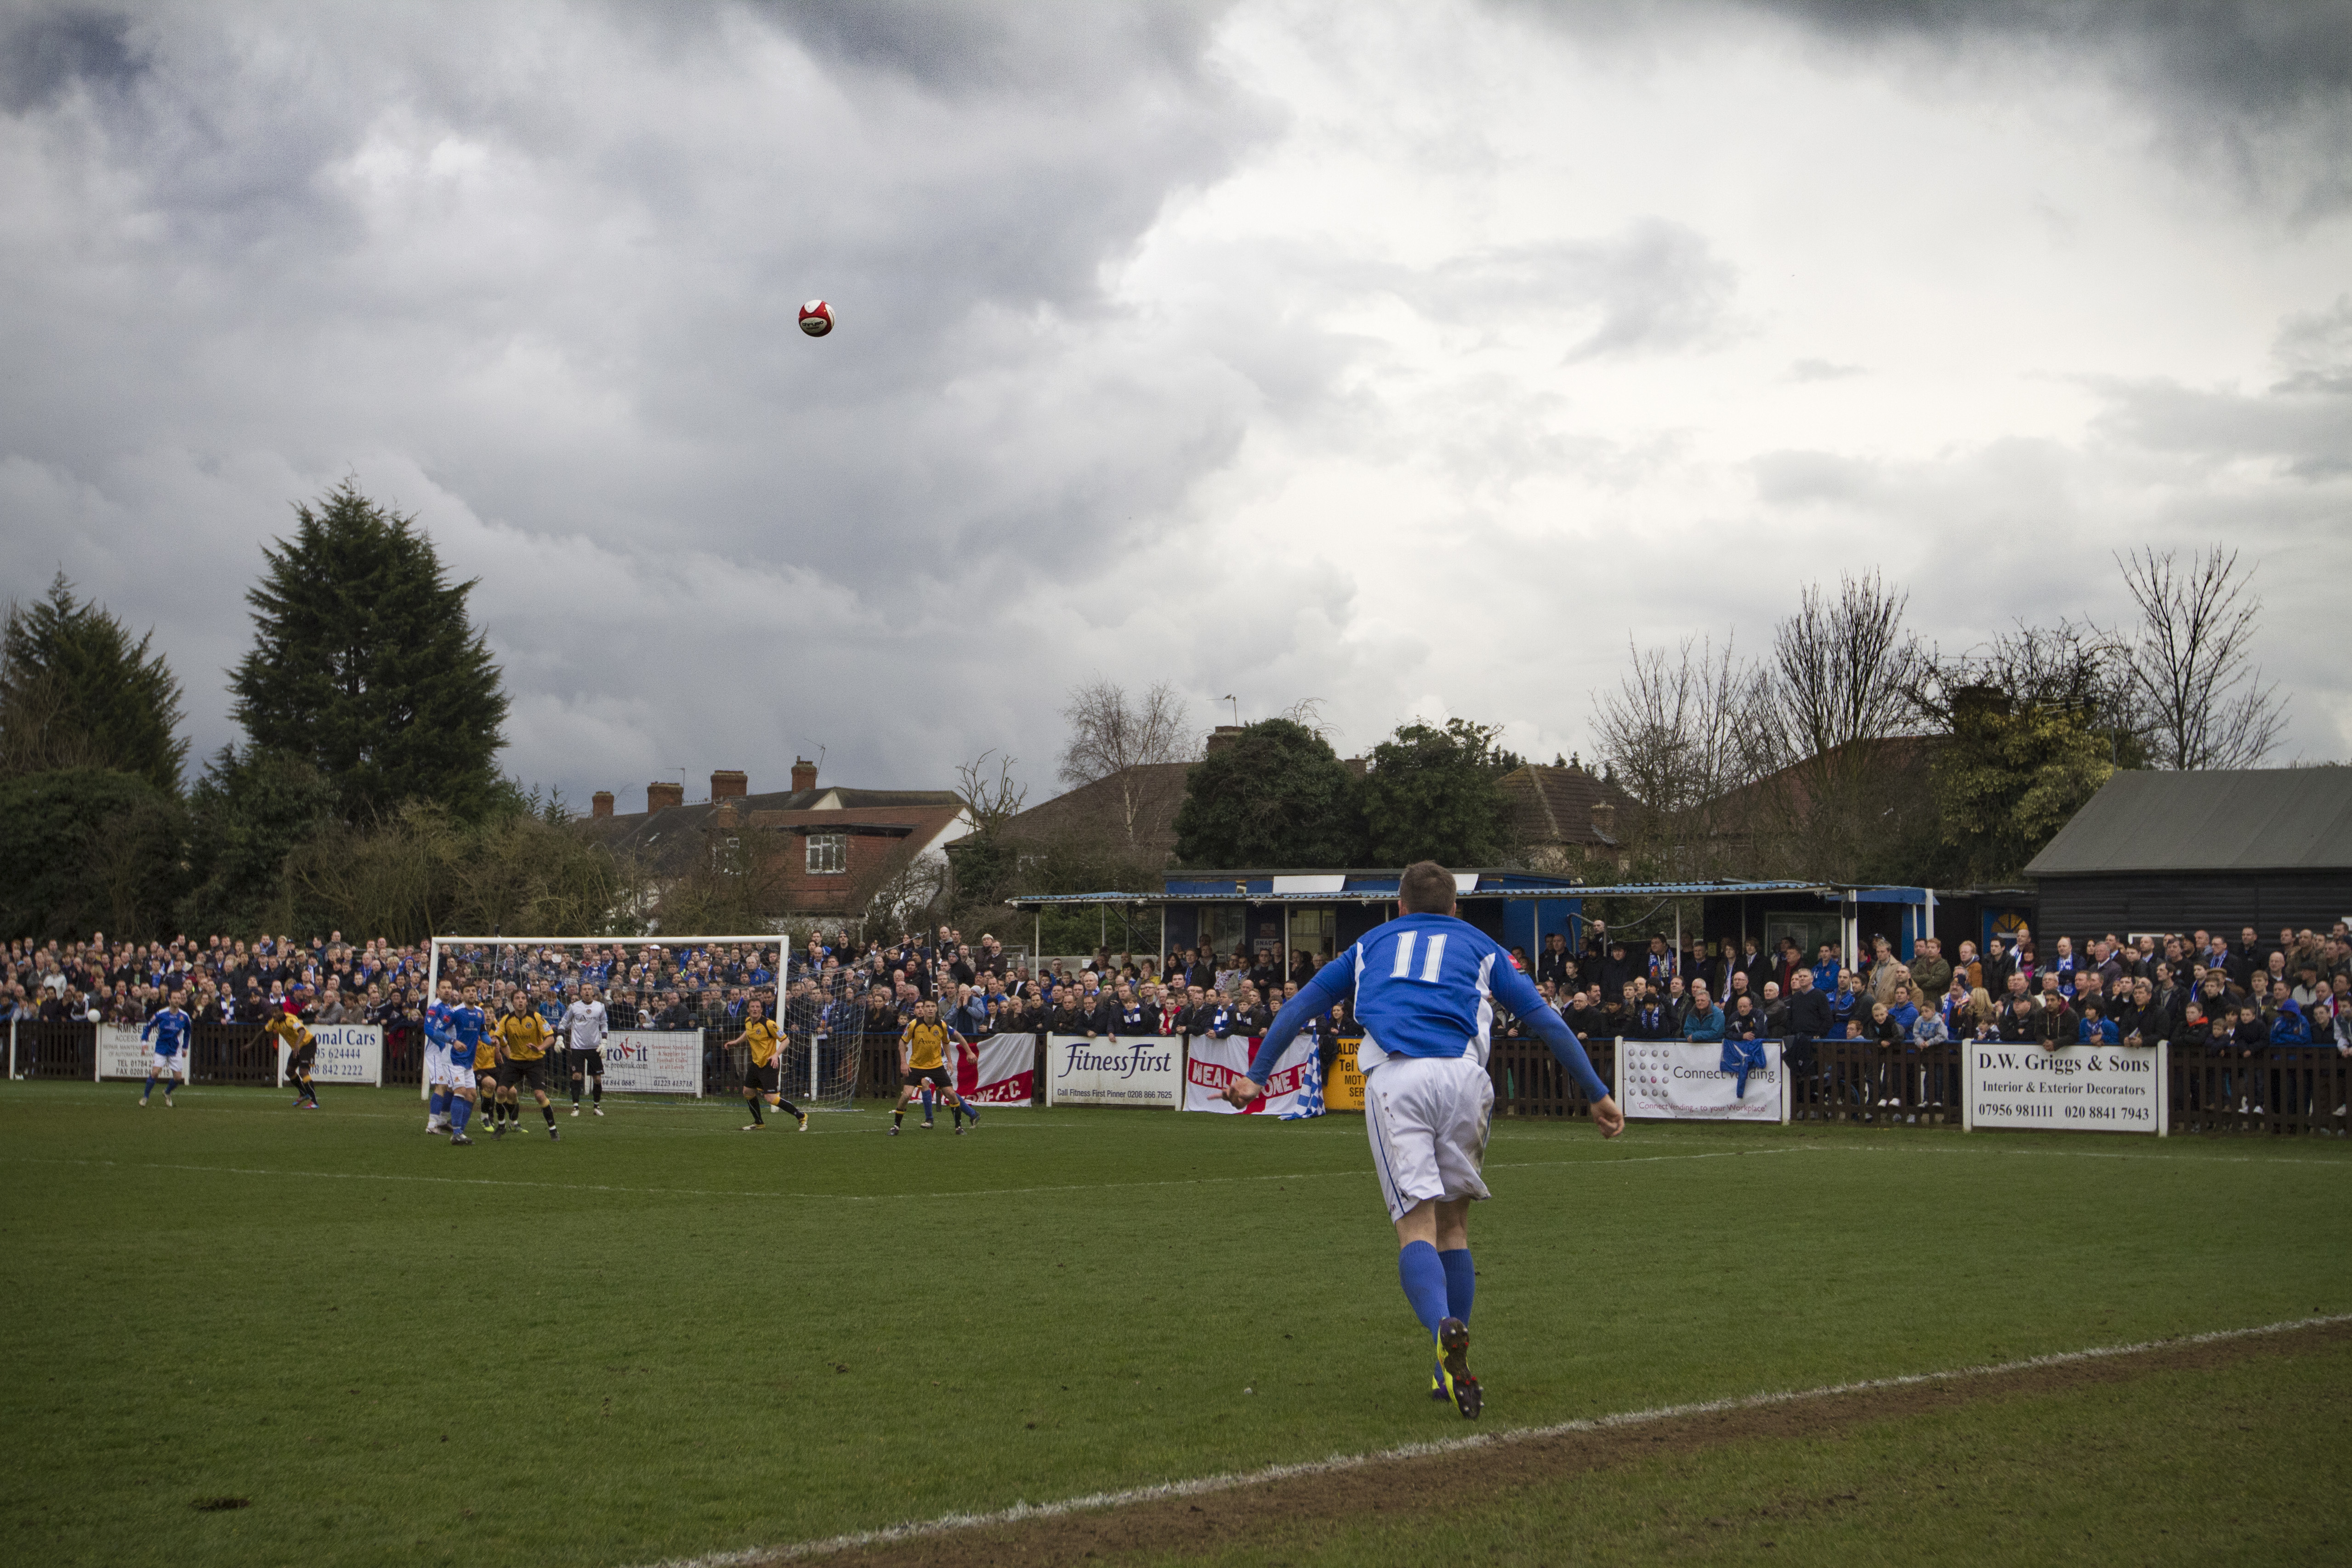 Lee Chappell taking a long throw - Wealdstone FC - FA Trophy Final